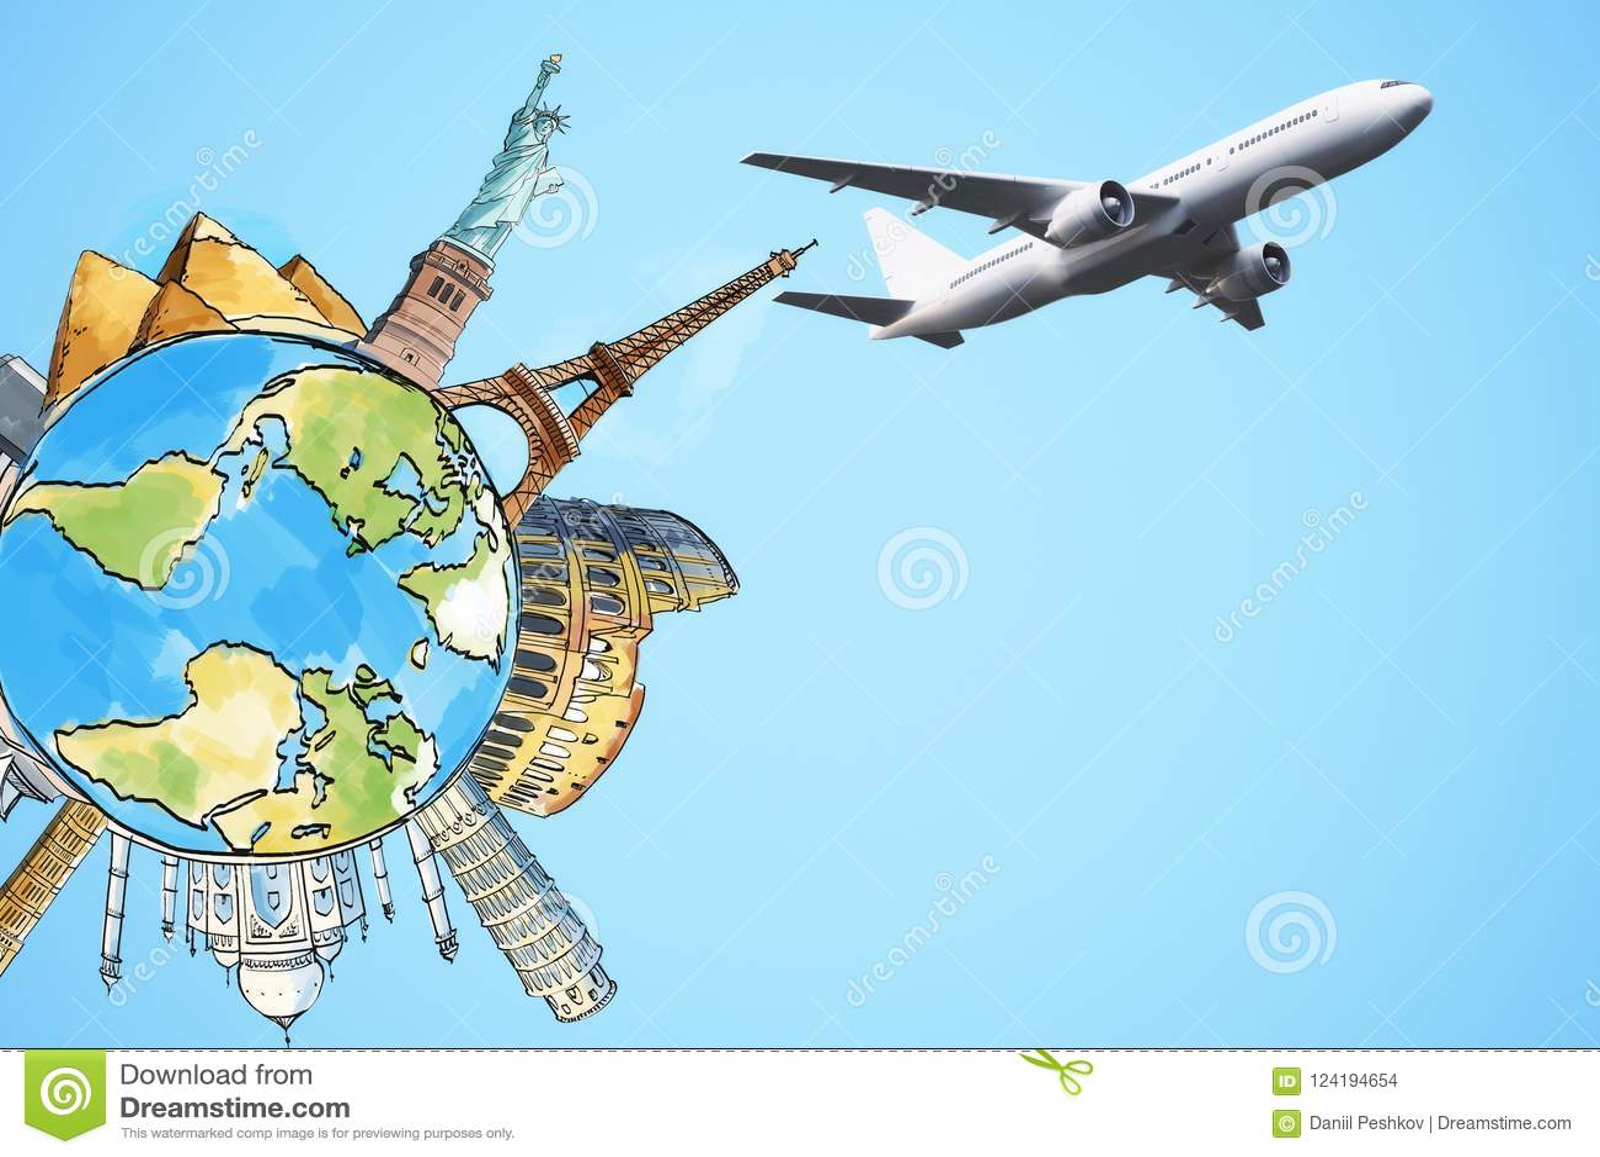 transporation and worldwide journey concept stock illustration